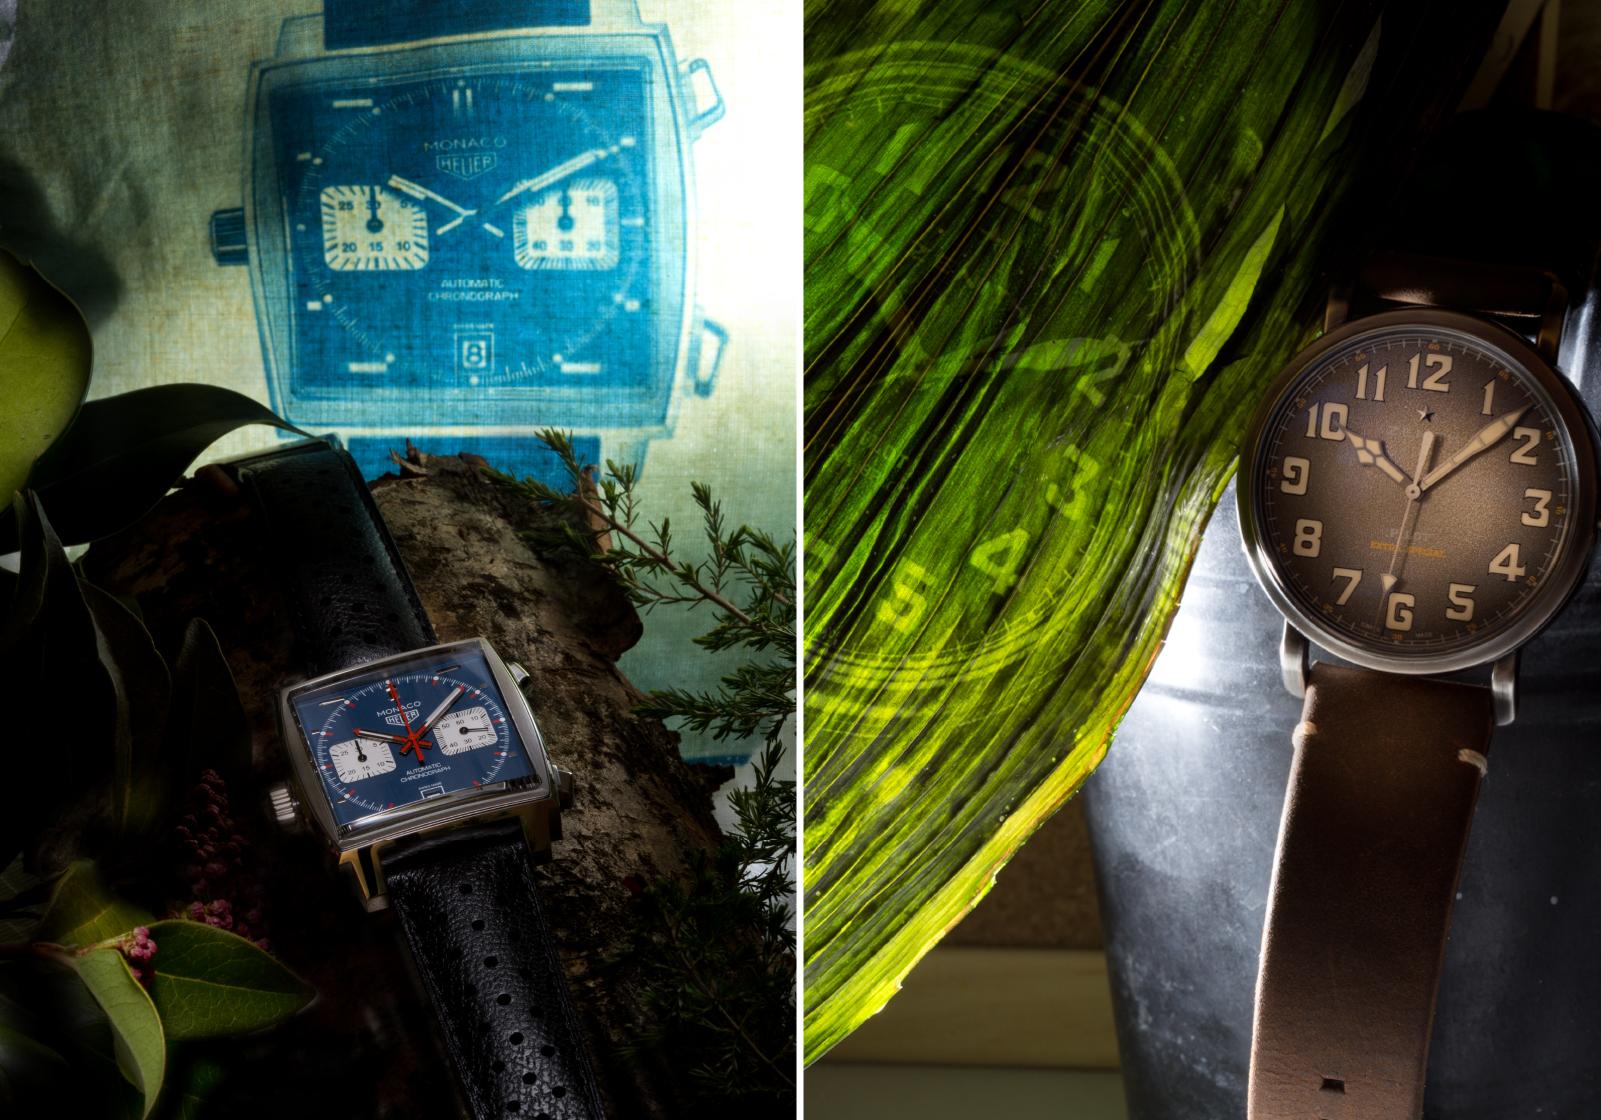 TAG Heuer Monaco Calibre 11 Automatic Chronograph Ref. CAW211P.FC6356 Corda automática   Aço   Ø 39 mm e Zenith Pilot Type 20 Ton Up Ref. 11.2430.679/21   © Paulo Pires / Espiral do Tempo